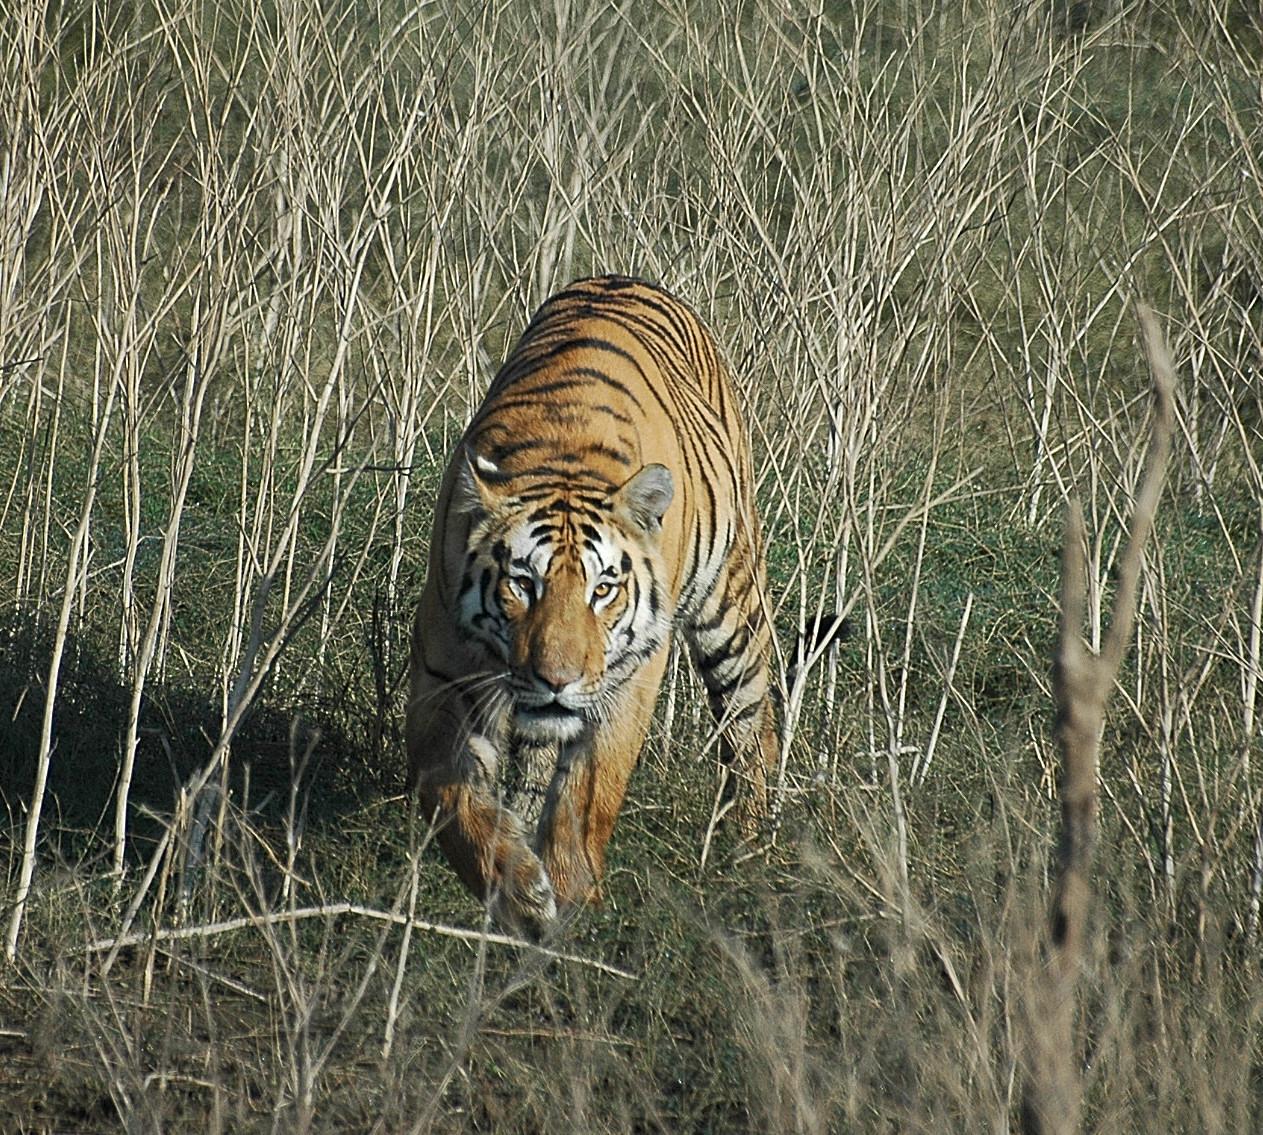 Tigre de Pench National Park